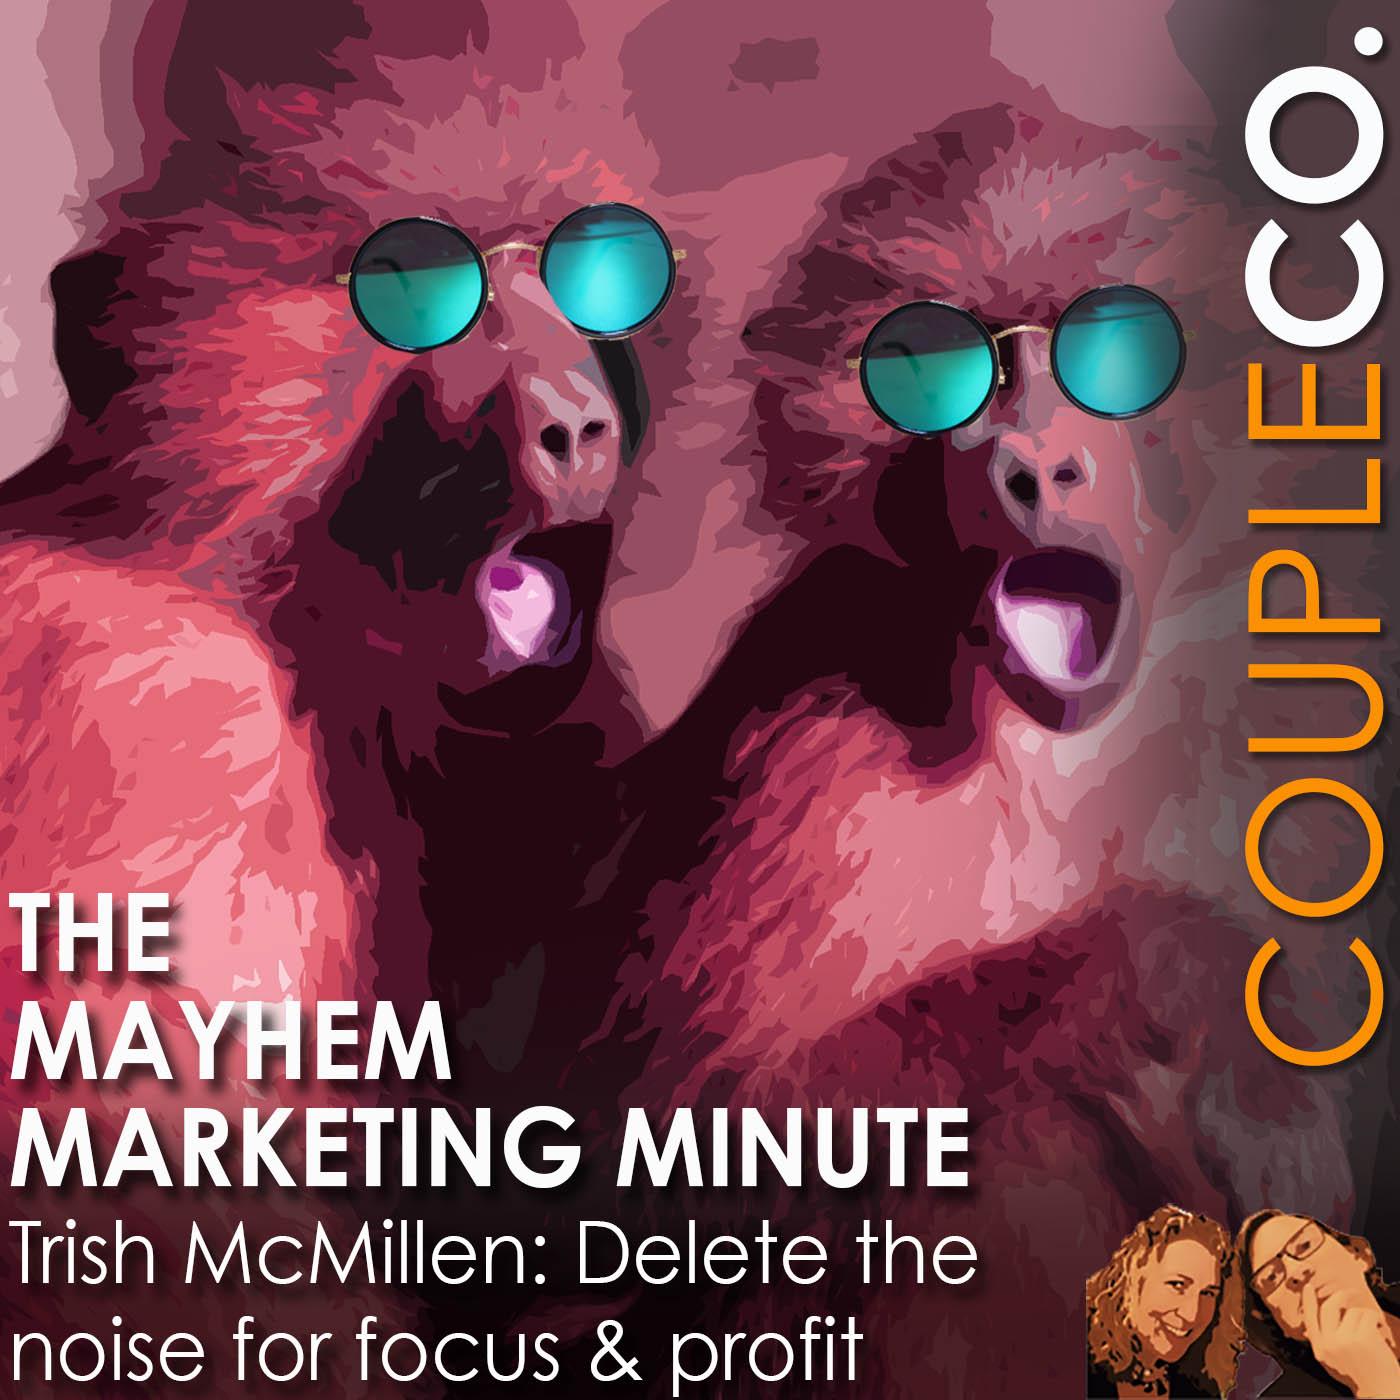 Mayhem Marketing Minute: Delete The Noise For Focus & Profit